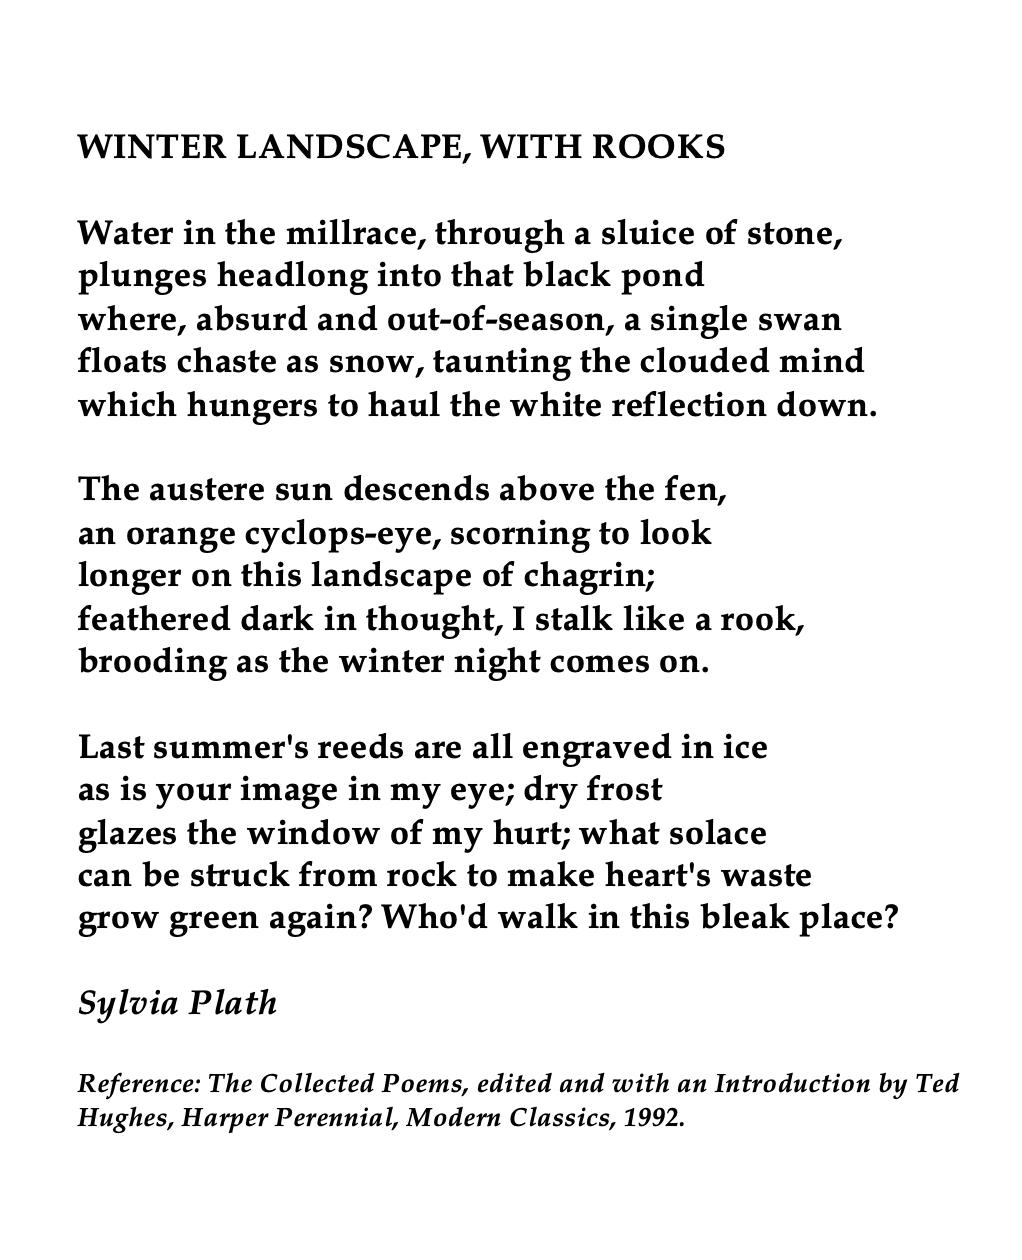 Sylvia Plath Winter Landscape With Rook Word Poems John Keat Ode To Autumn Analysis Analysi Summary Pdf